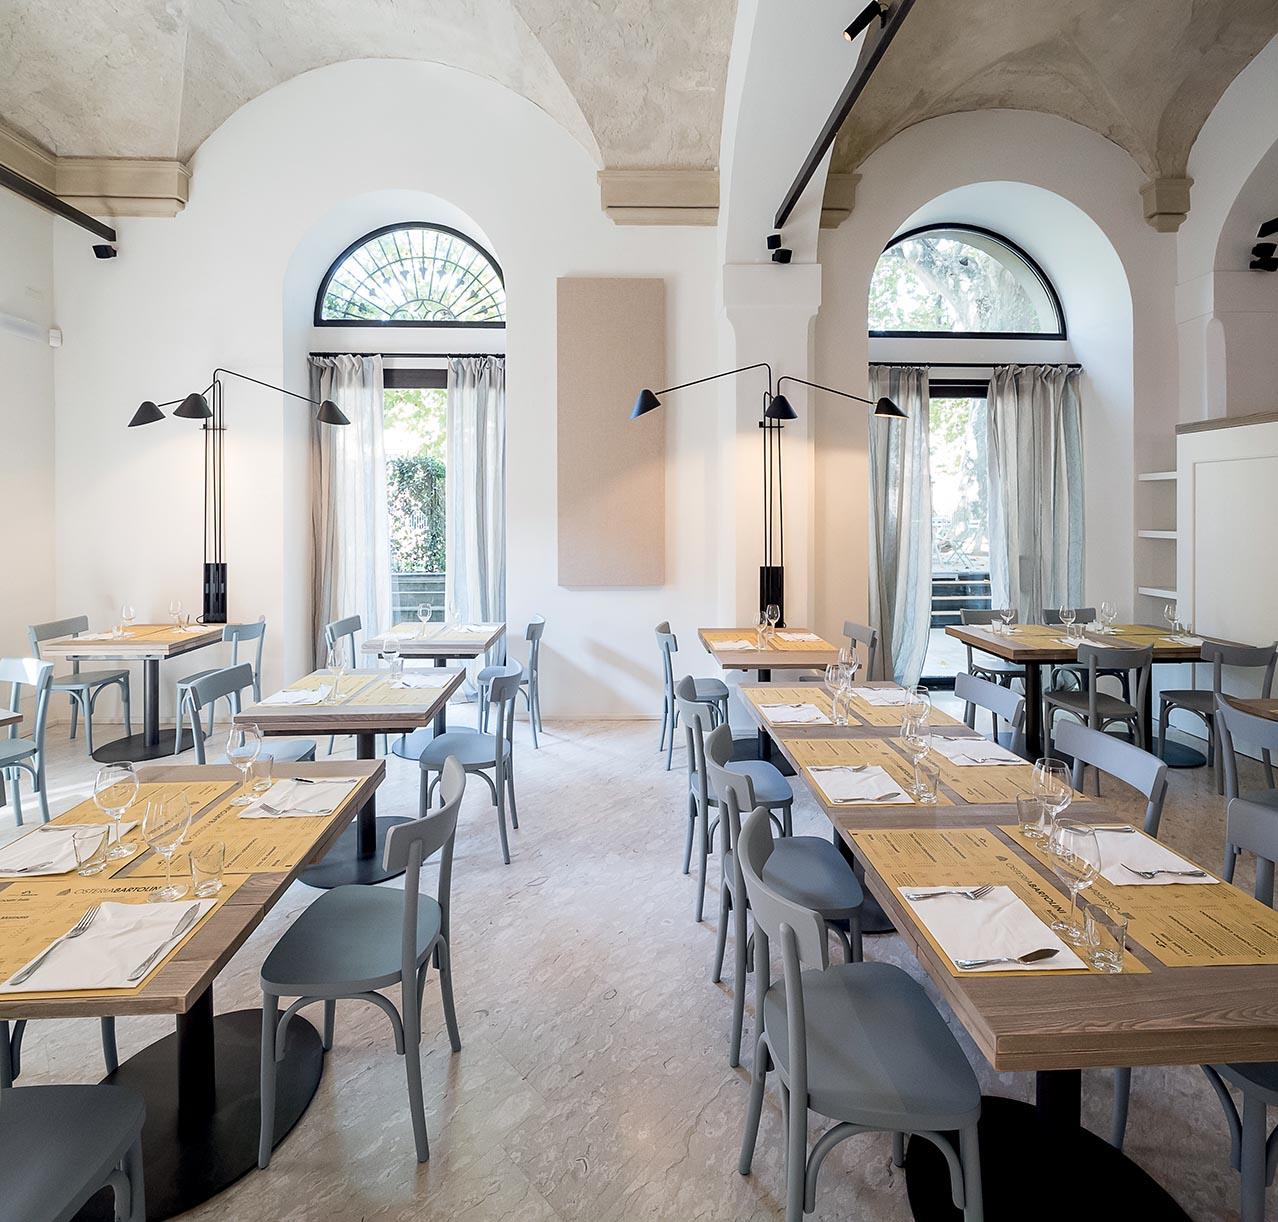 l\'osteria Bartolini - GourmetFood - La Madia Travelfood